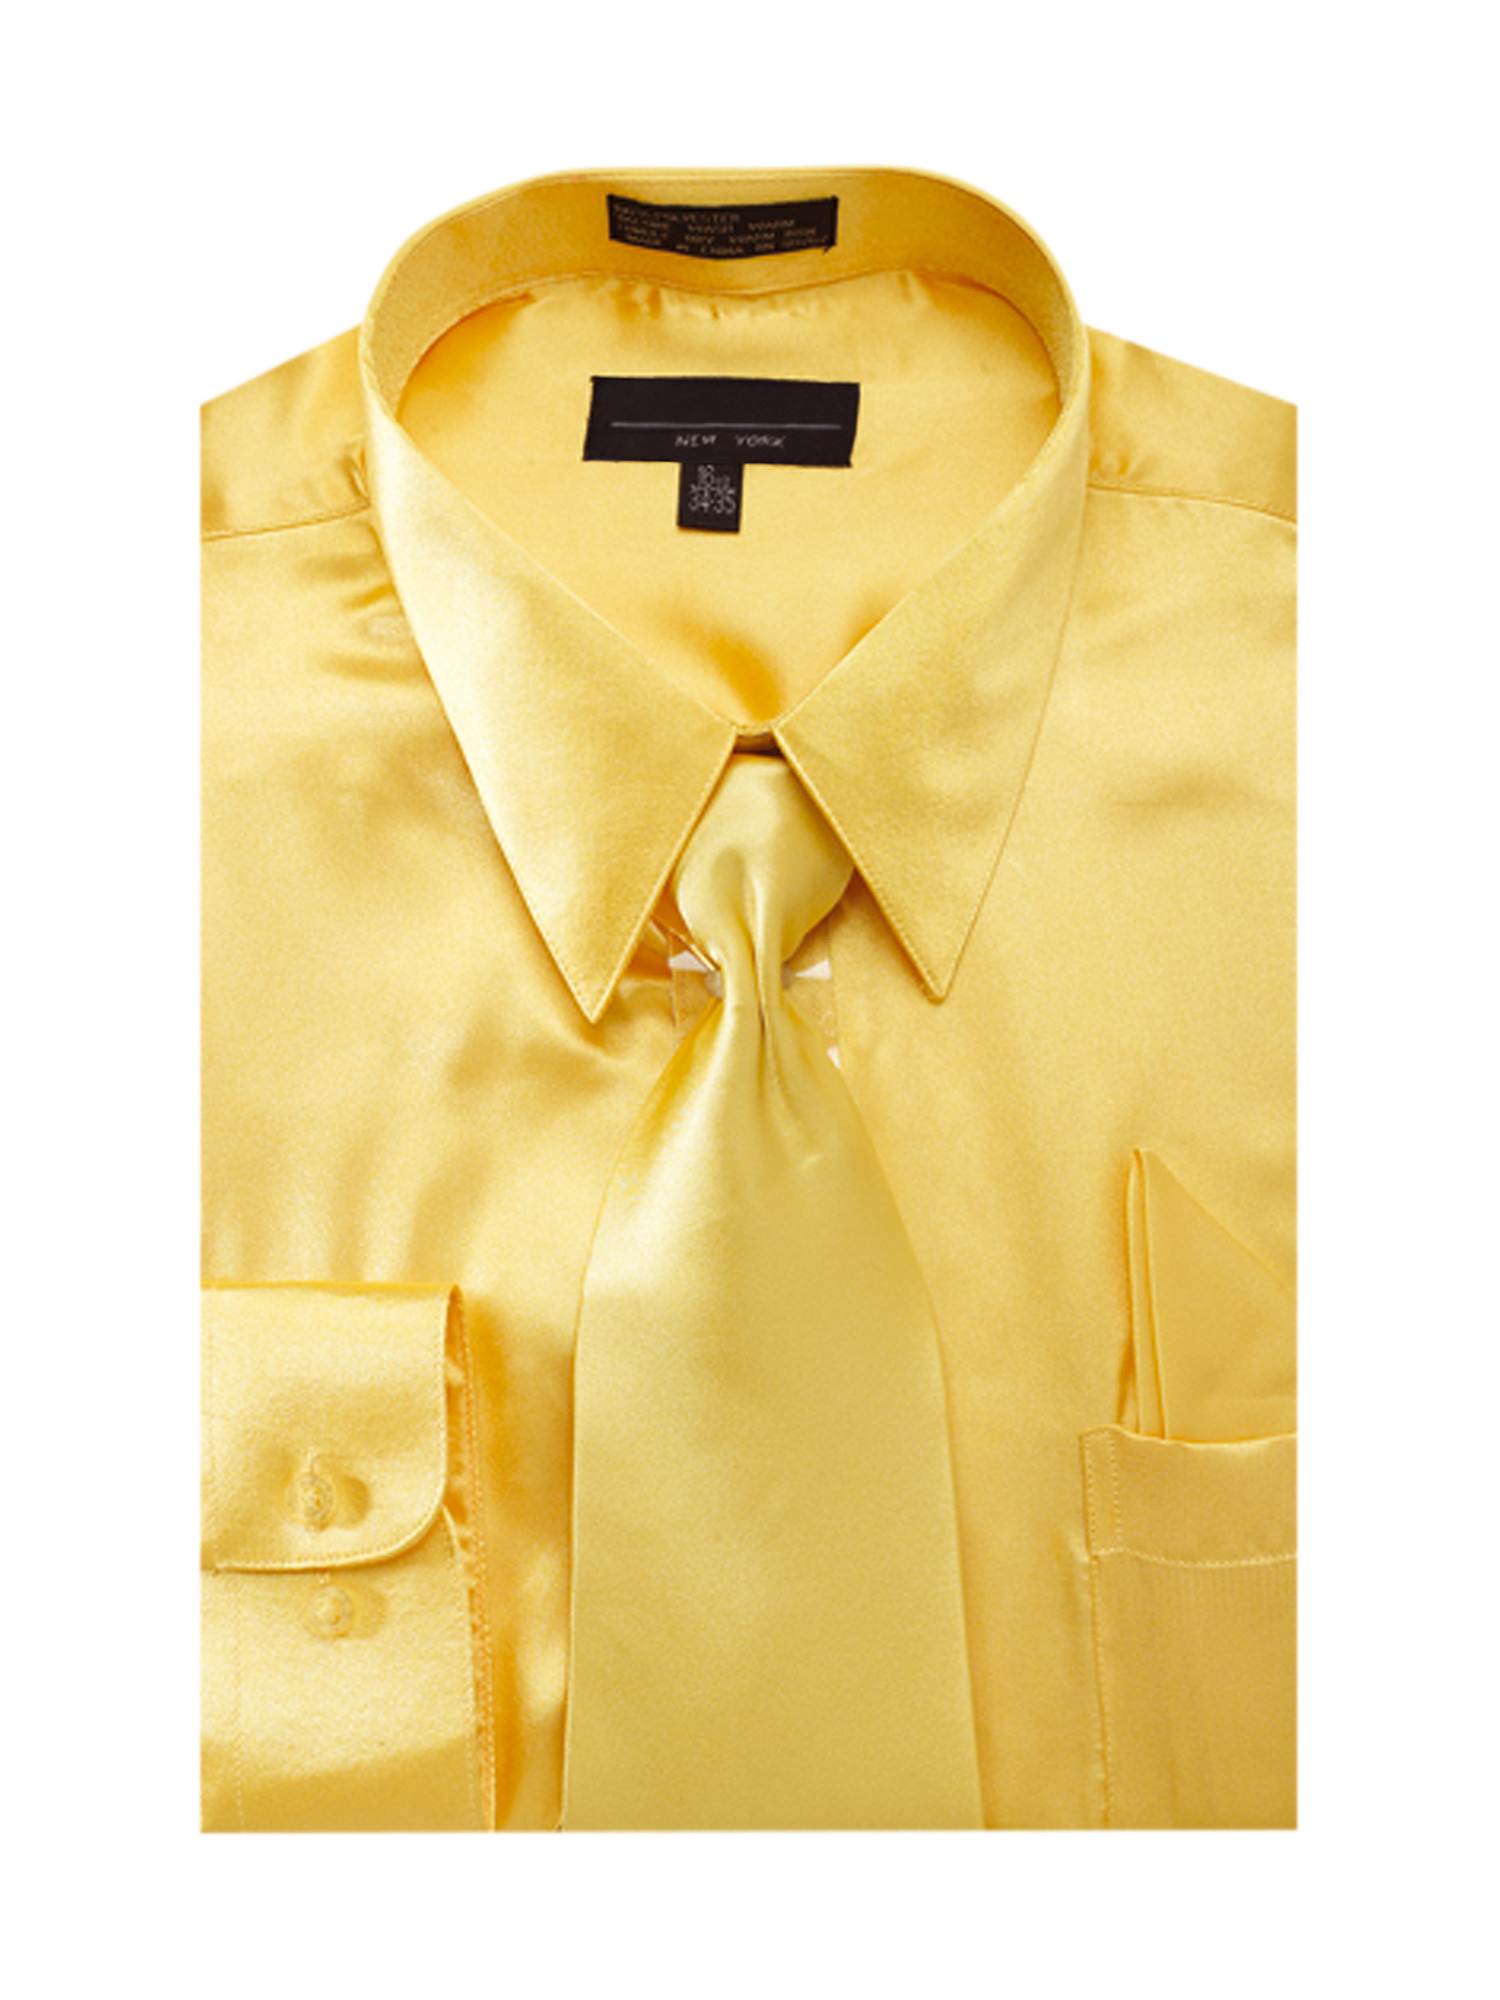 Men's Solid Color Satin Dress Shirt Tie and Hanky Set